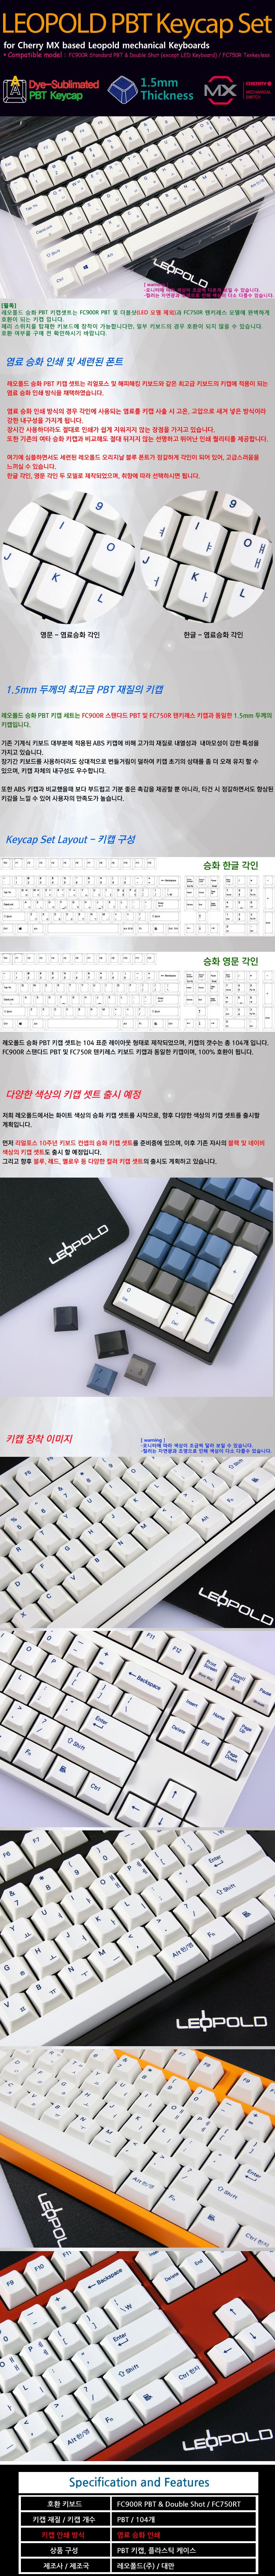 leopold_sub_keycapset_white_710.jpg